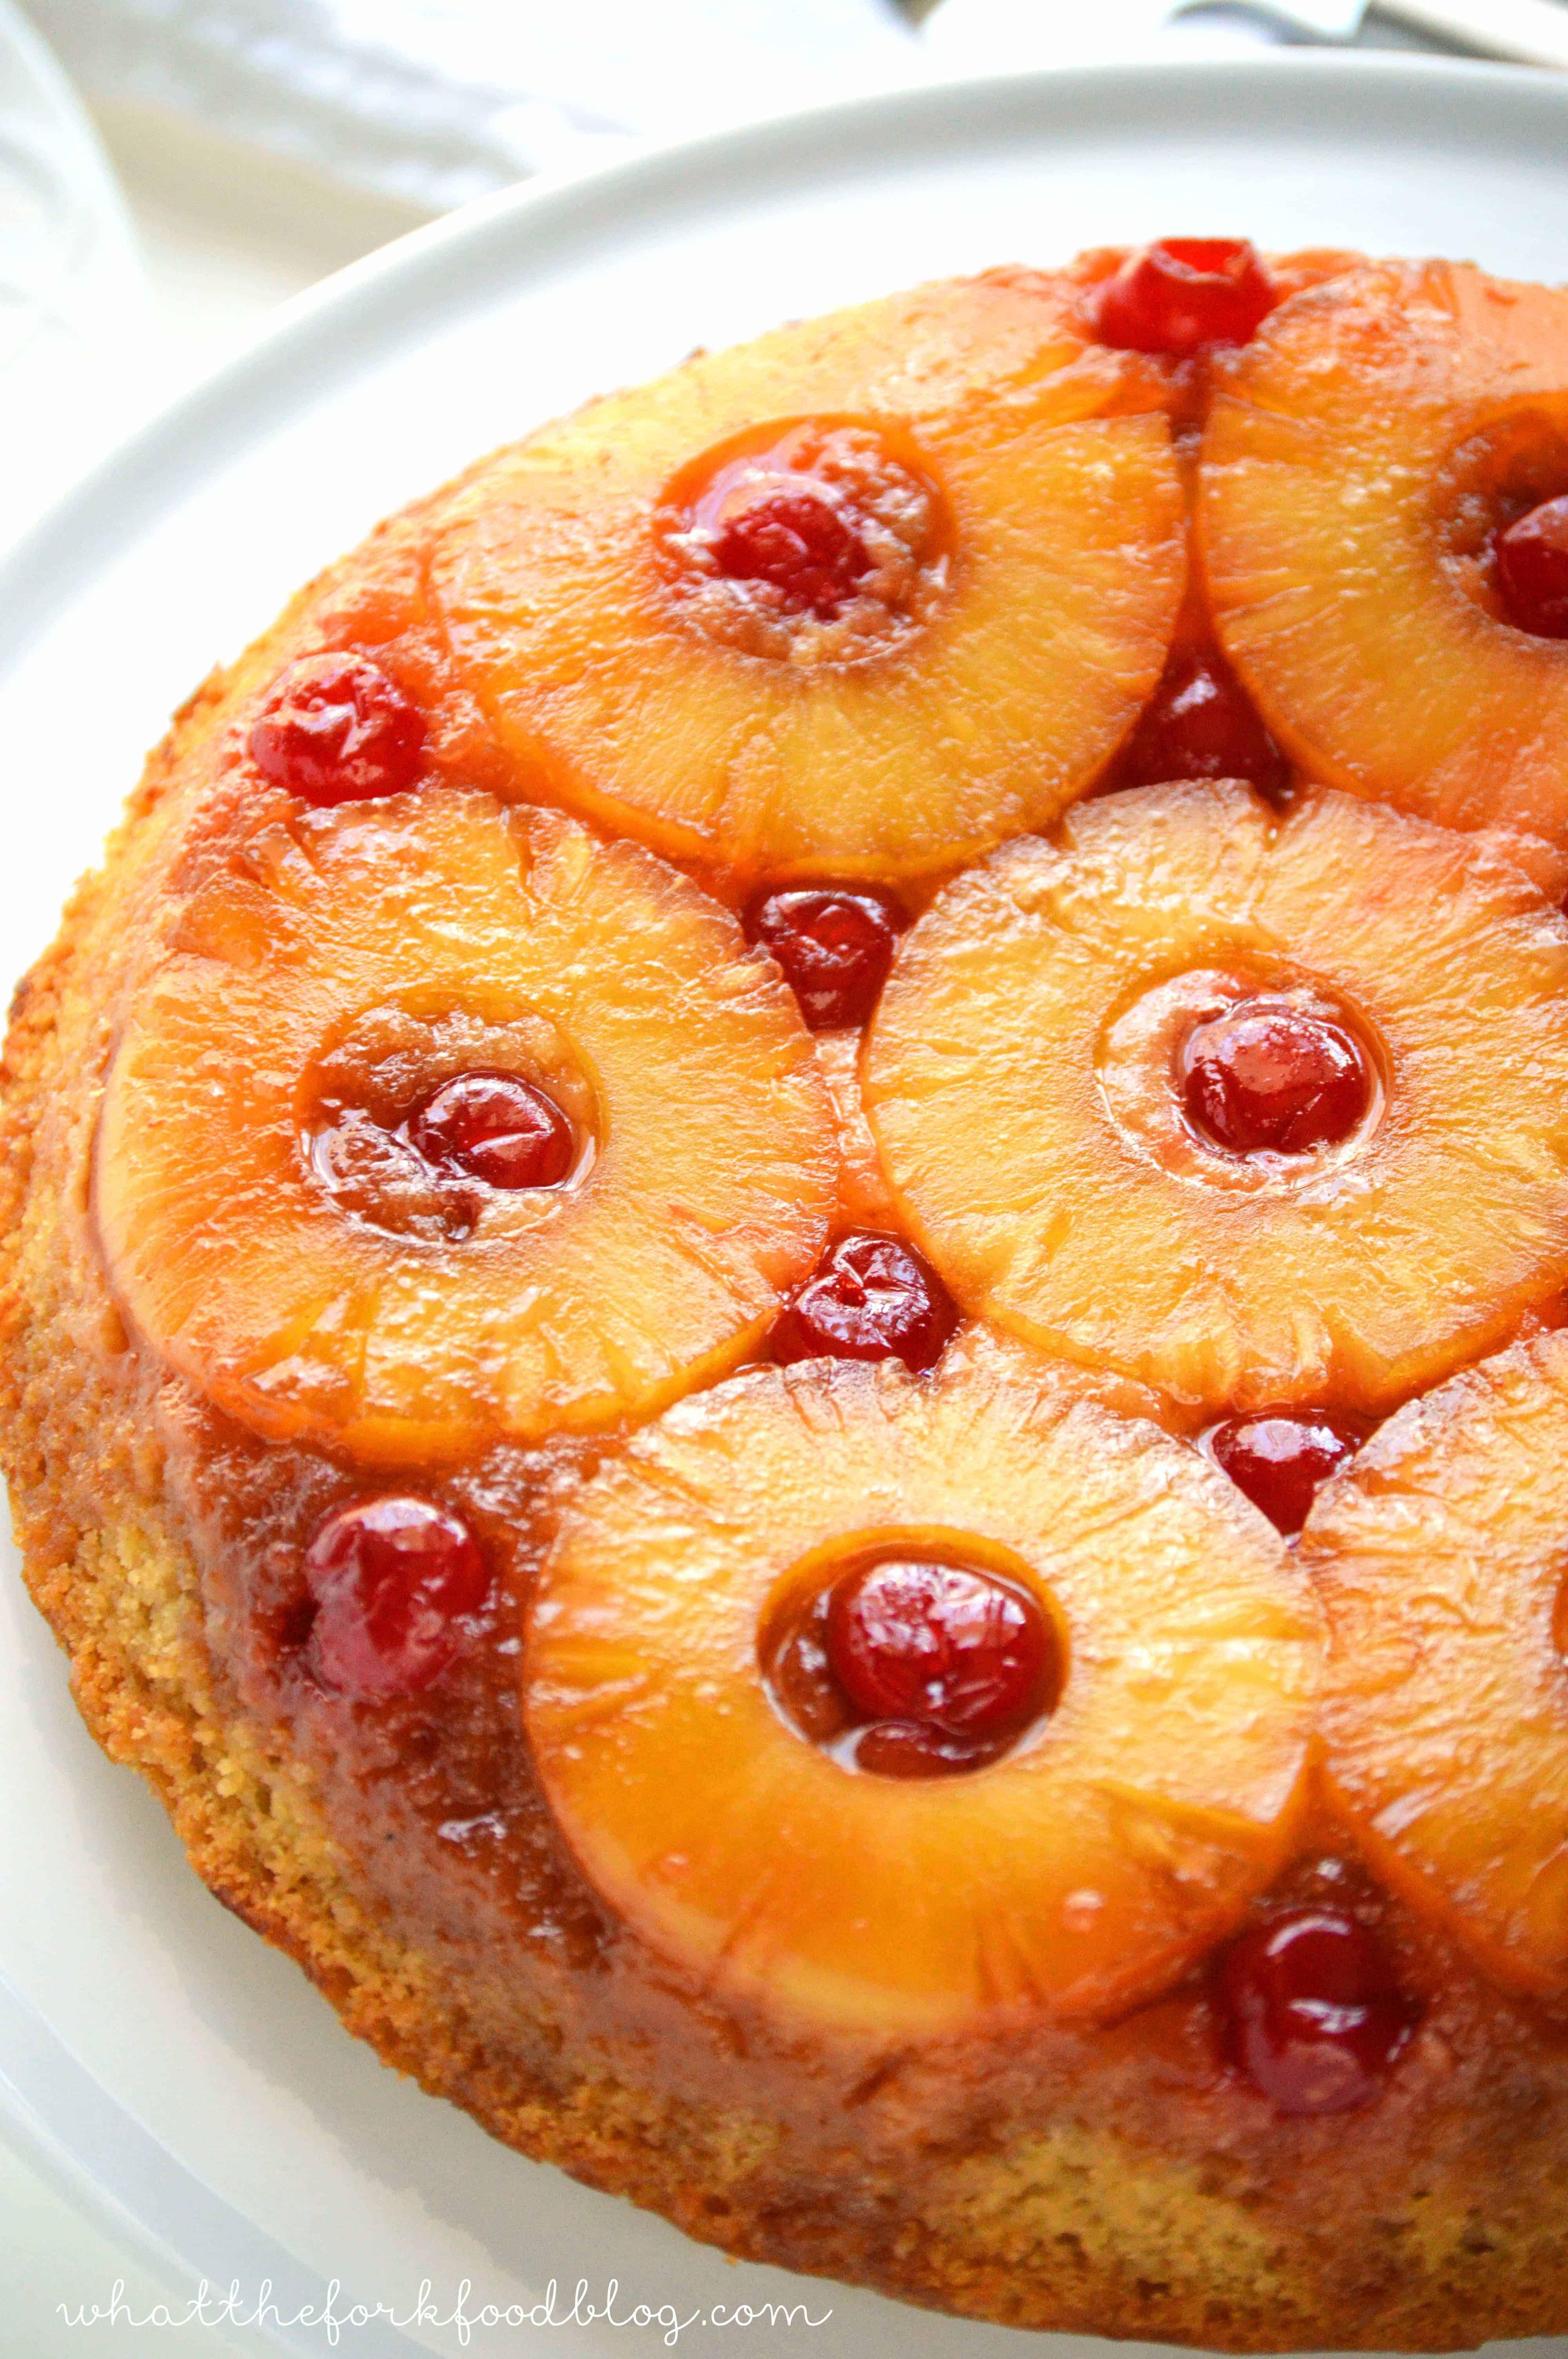 Pineapple Upside Cake  Gluten Free Pineapple Upside Down Cake What the Fork